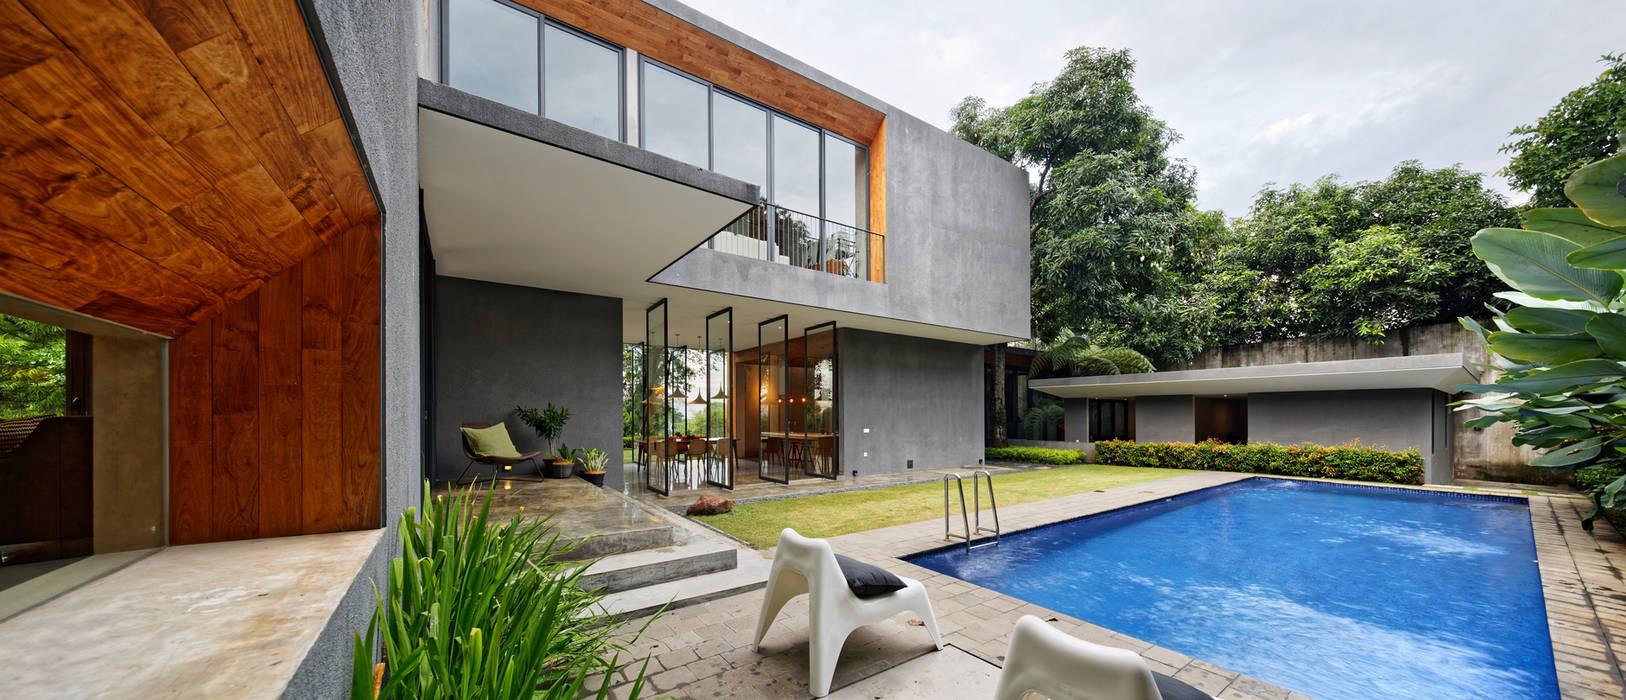 Casas de estilo  de Tamara Wibowo Architects